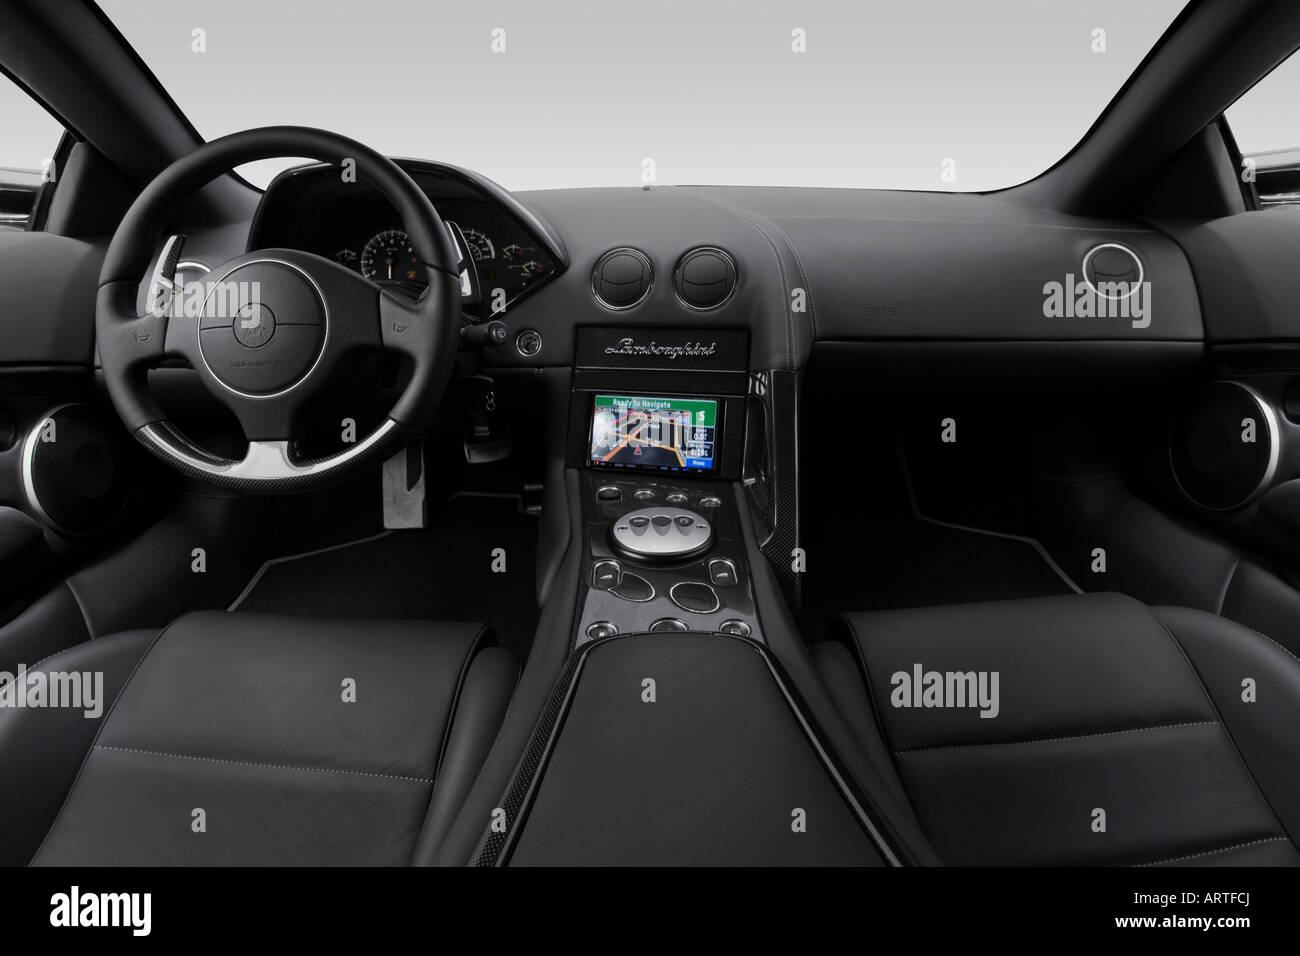 2008 Lamborghini Murcielago Lp640 In Gray Dashboard Center Stock